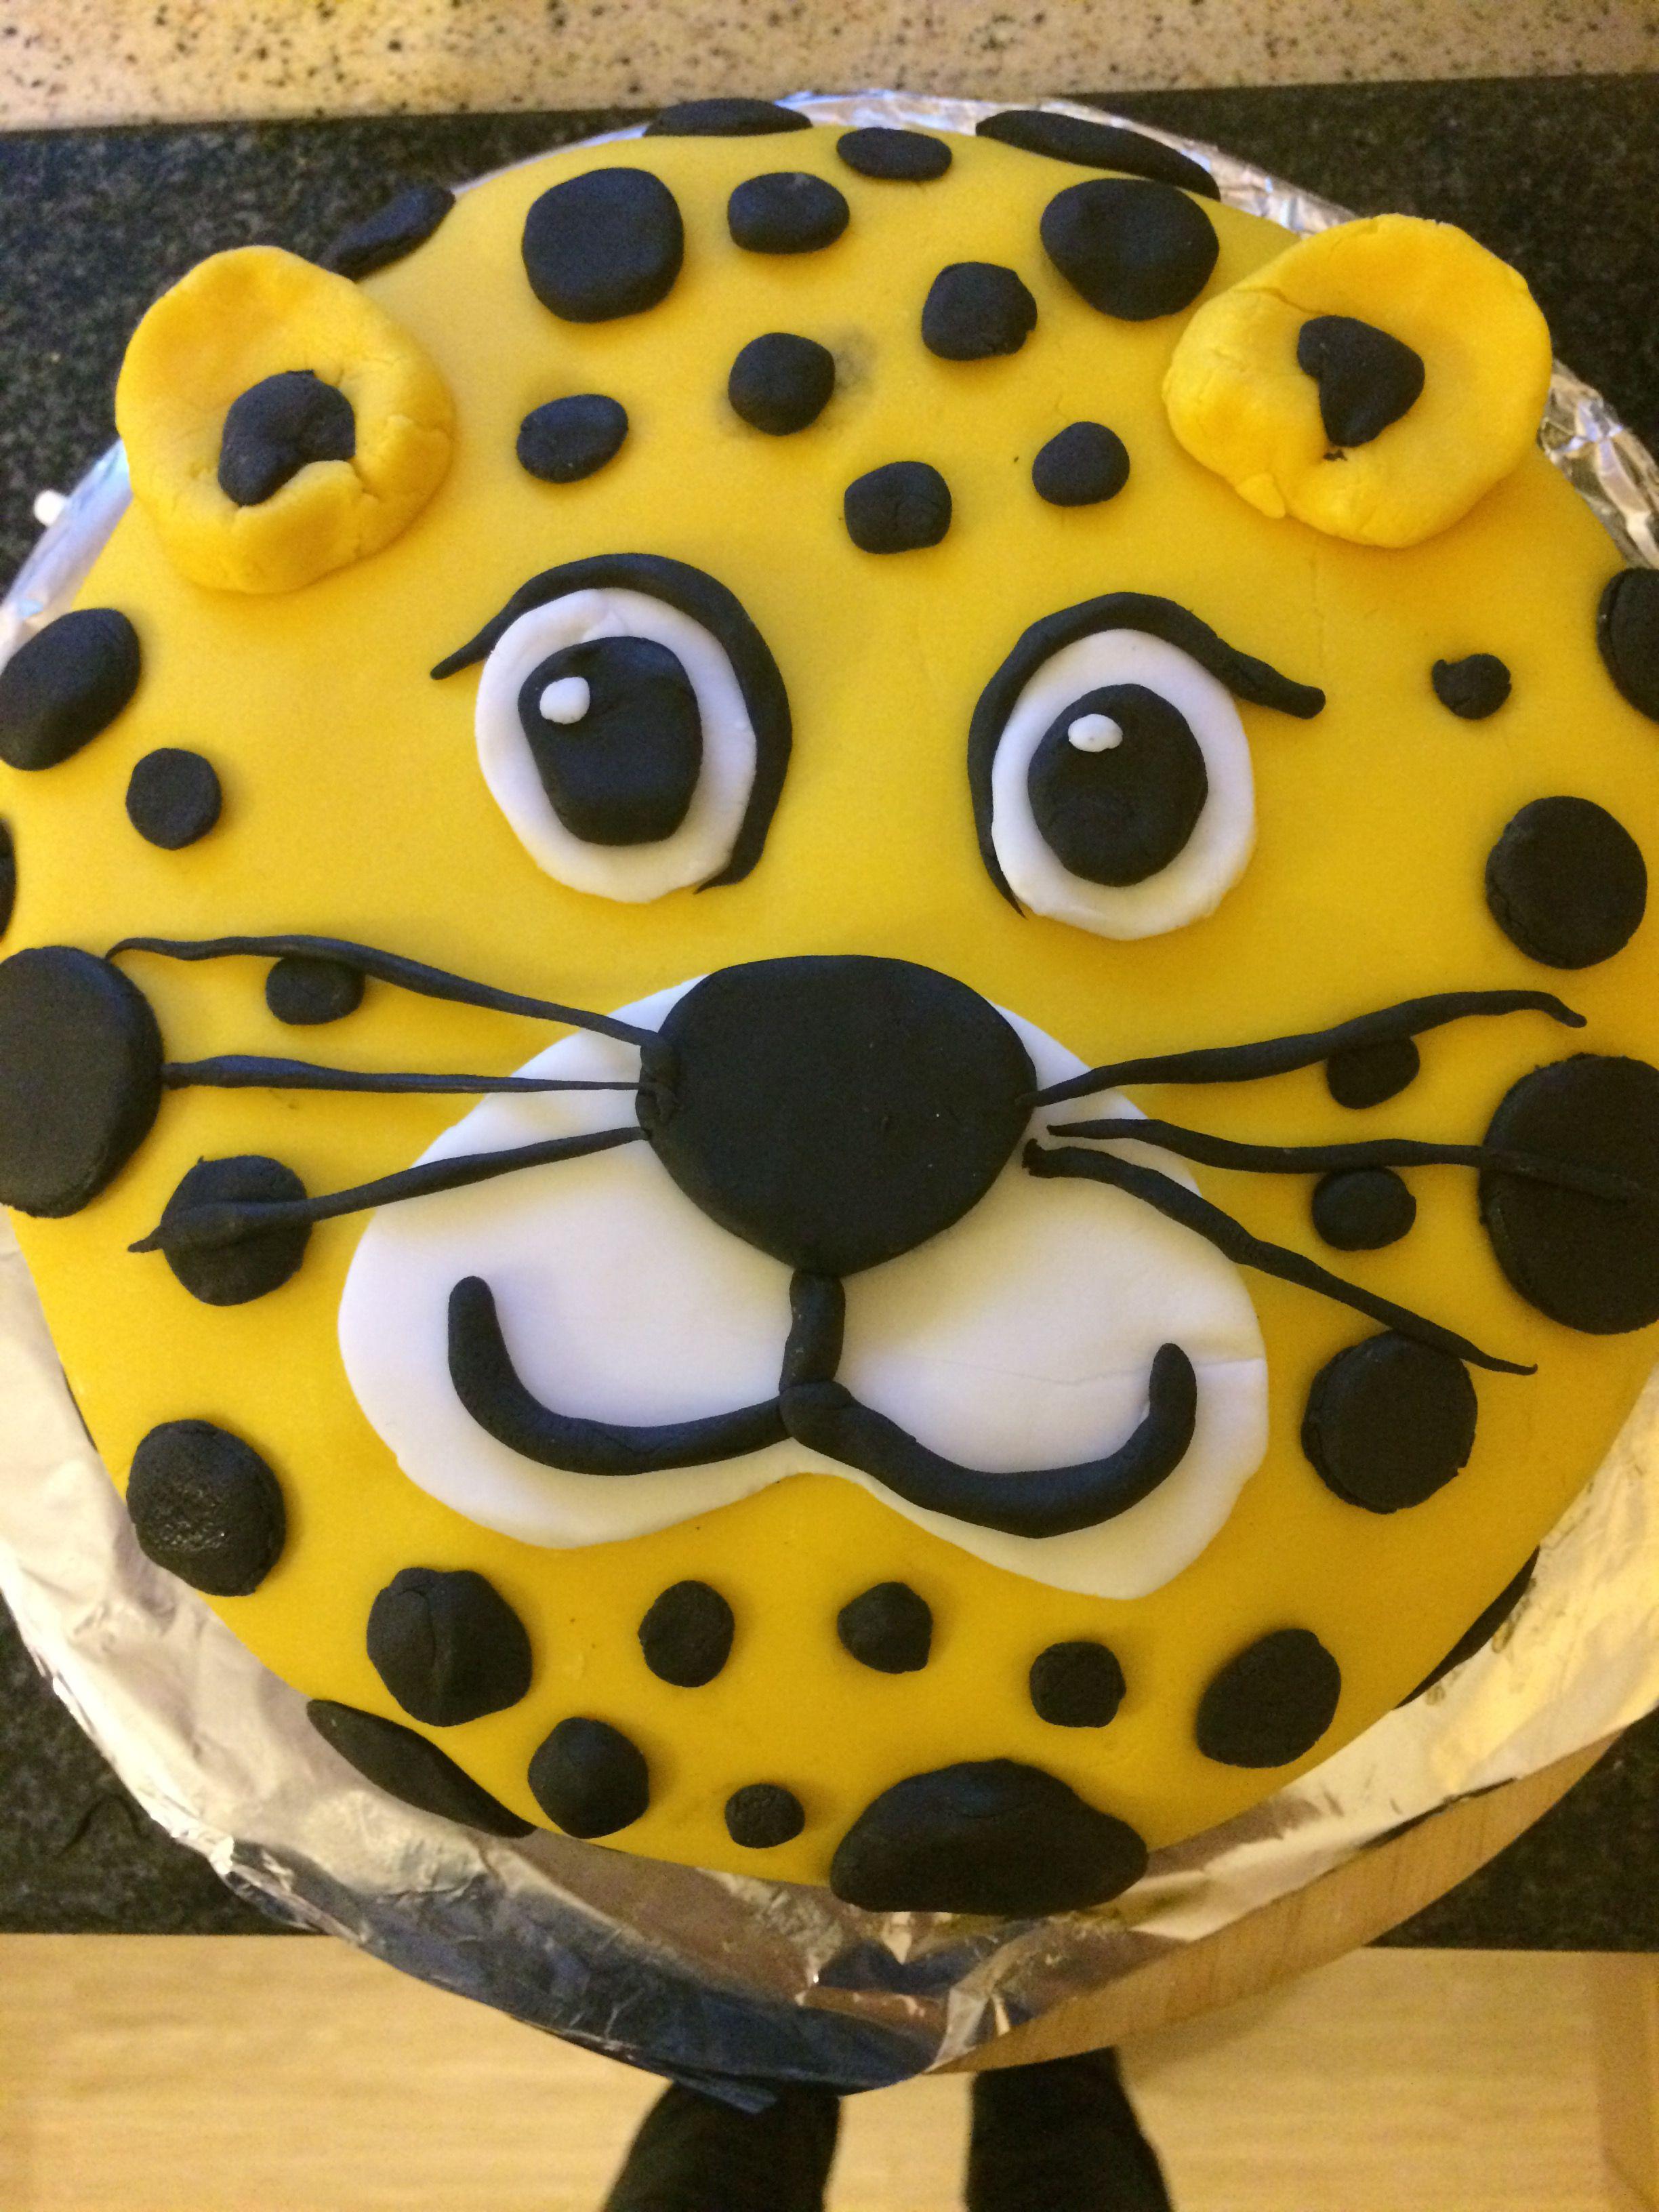 Sensational Cheetah Cake Cheetah Birthday Cakes Cheetah Cakes Cheetah Funny Birthday Cards Online Benoljebrpdamsfinfo